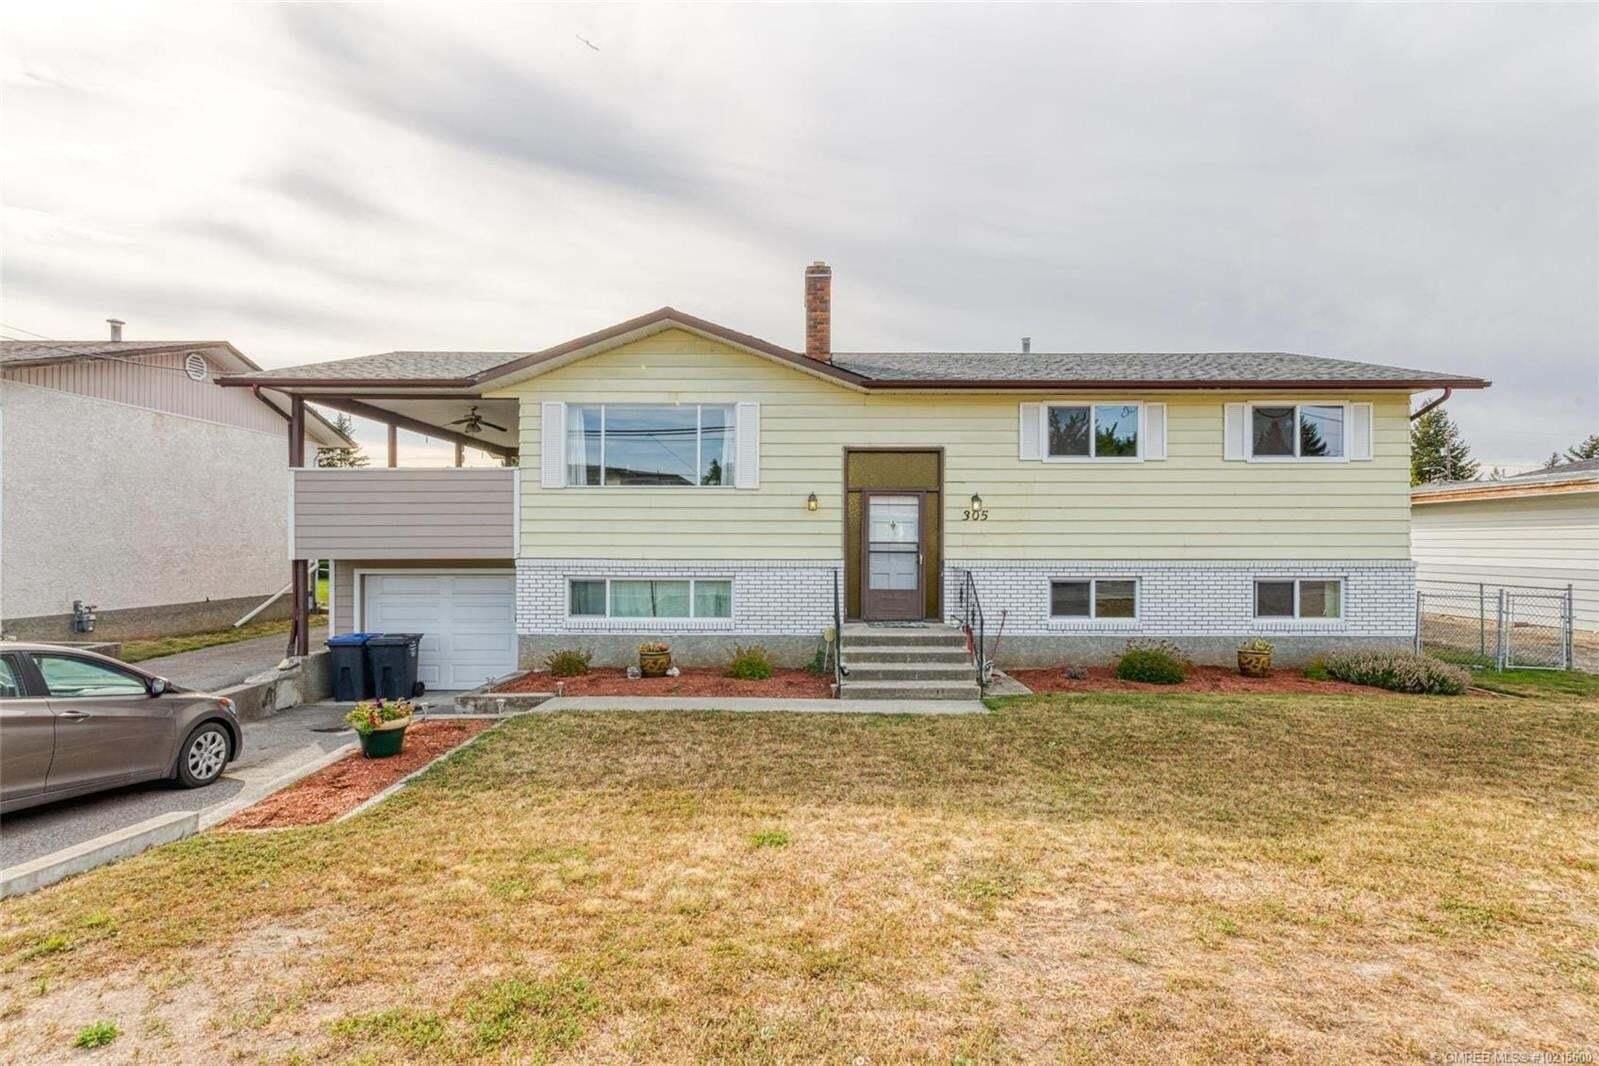 House for sale at 305 Mugford Rd Kelowna British Columbia - MLS: 10215600